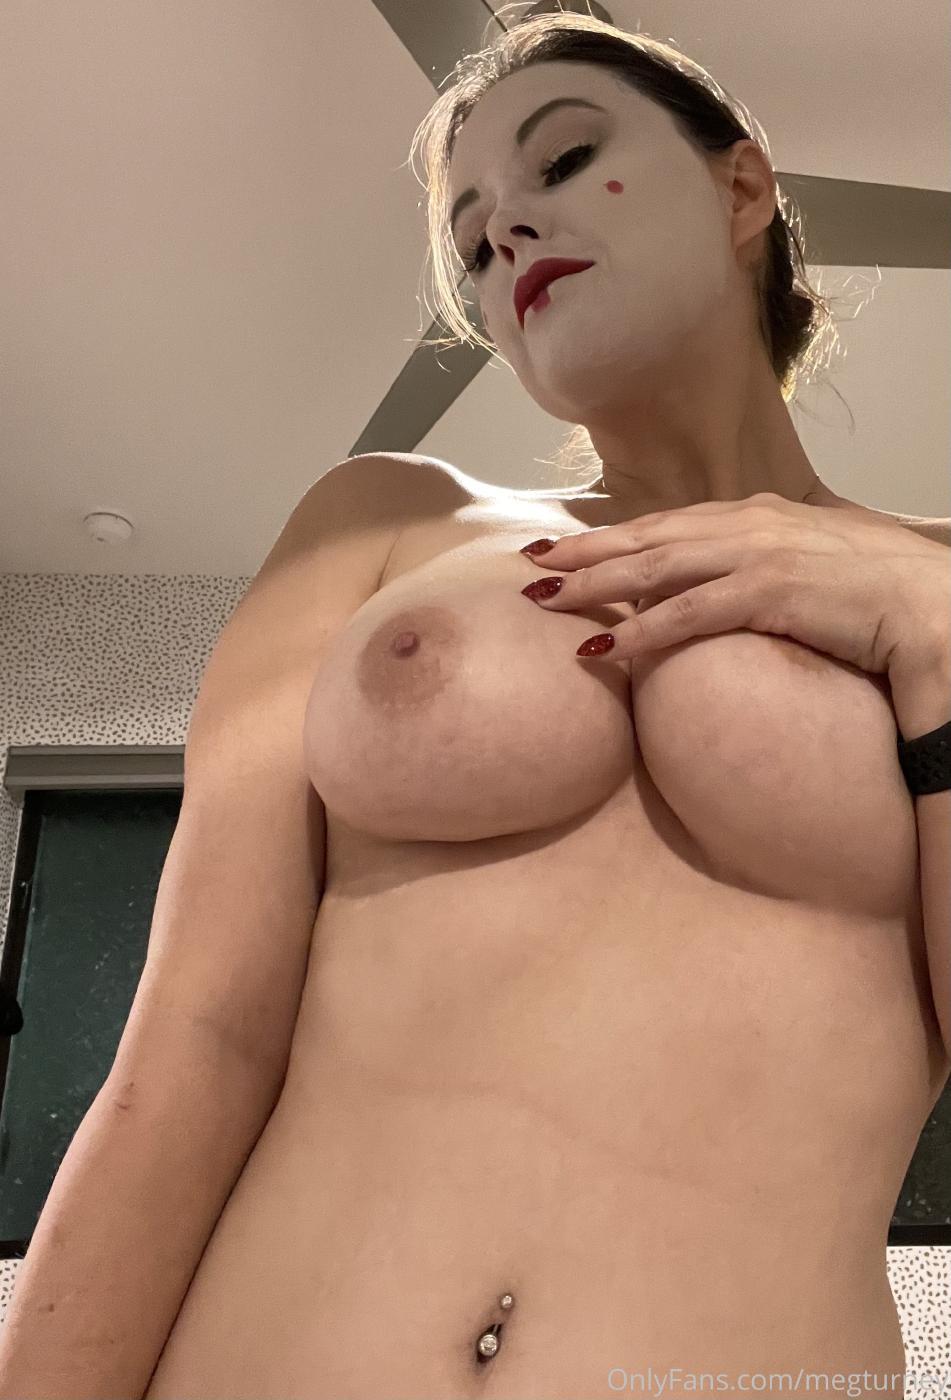 Meg Turney Topless Candids Onlyfans Set Leaked 0001